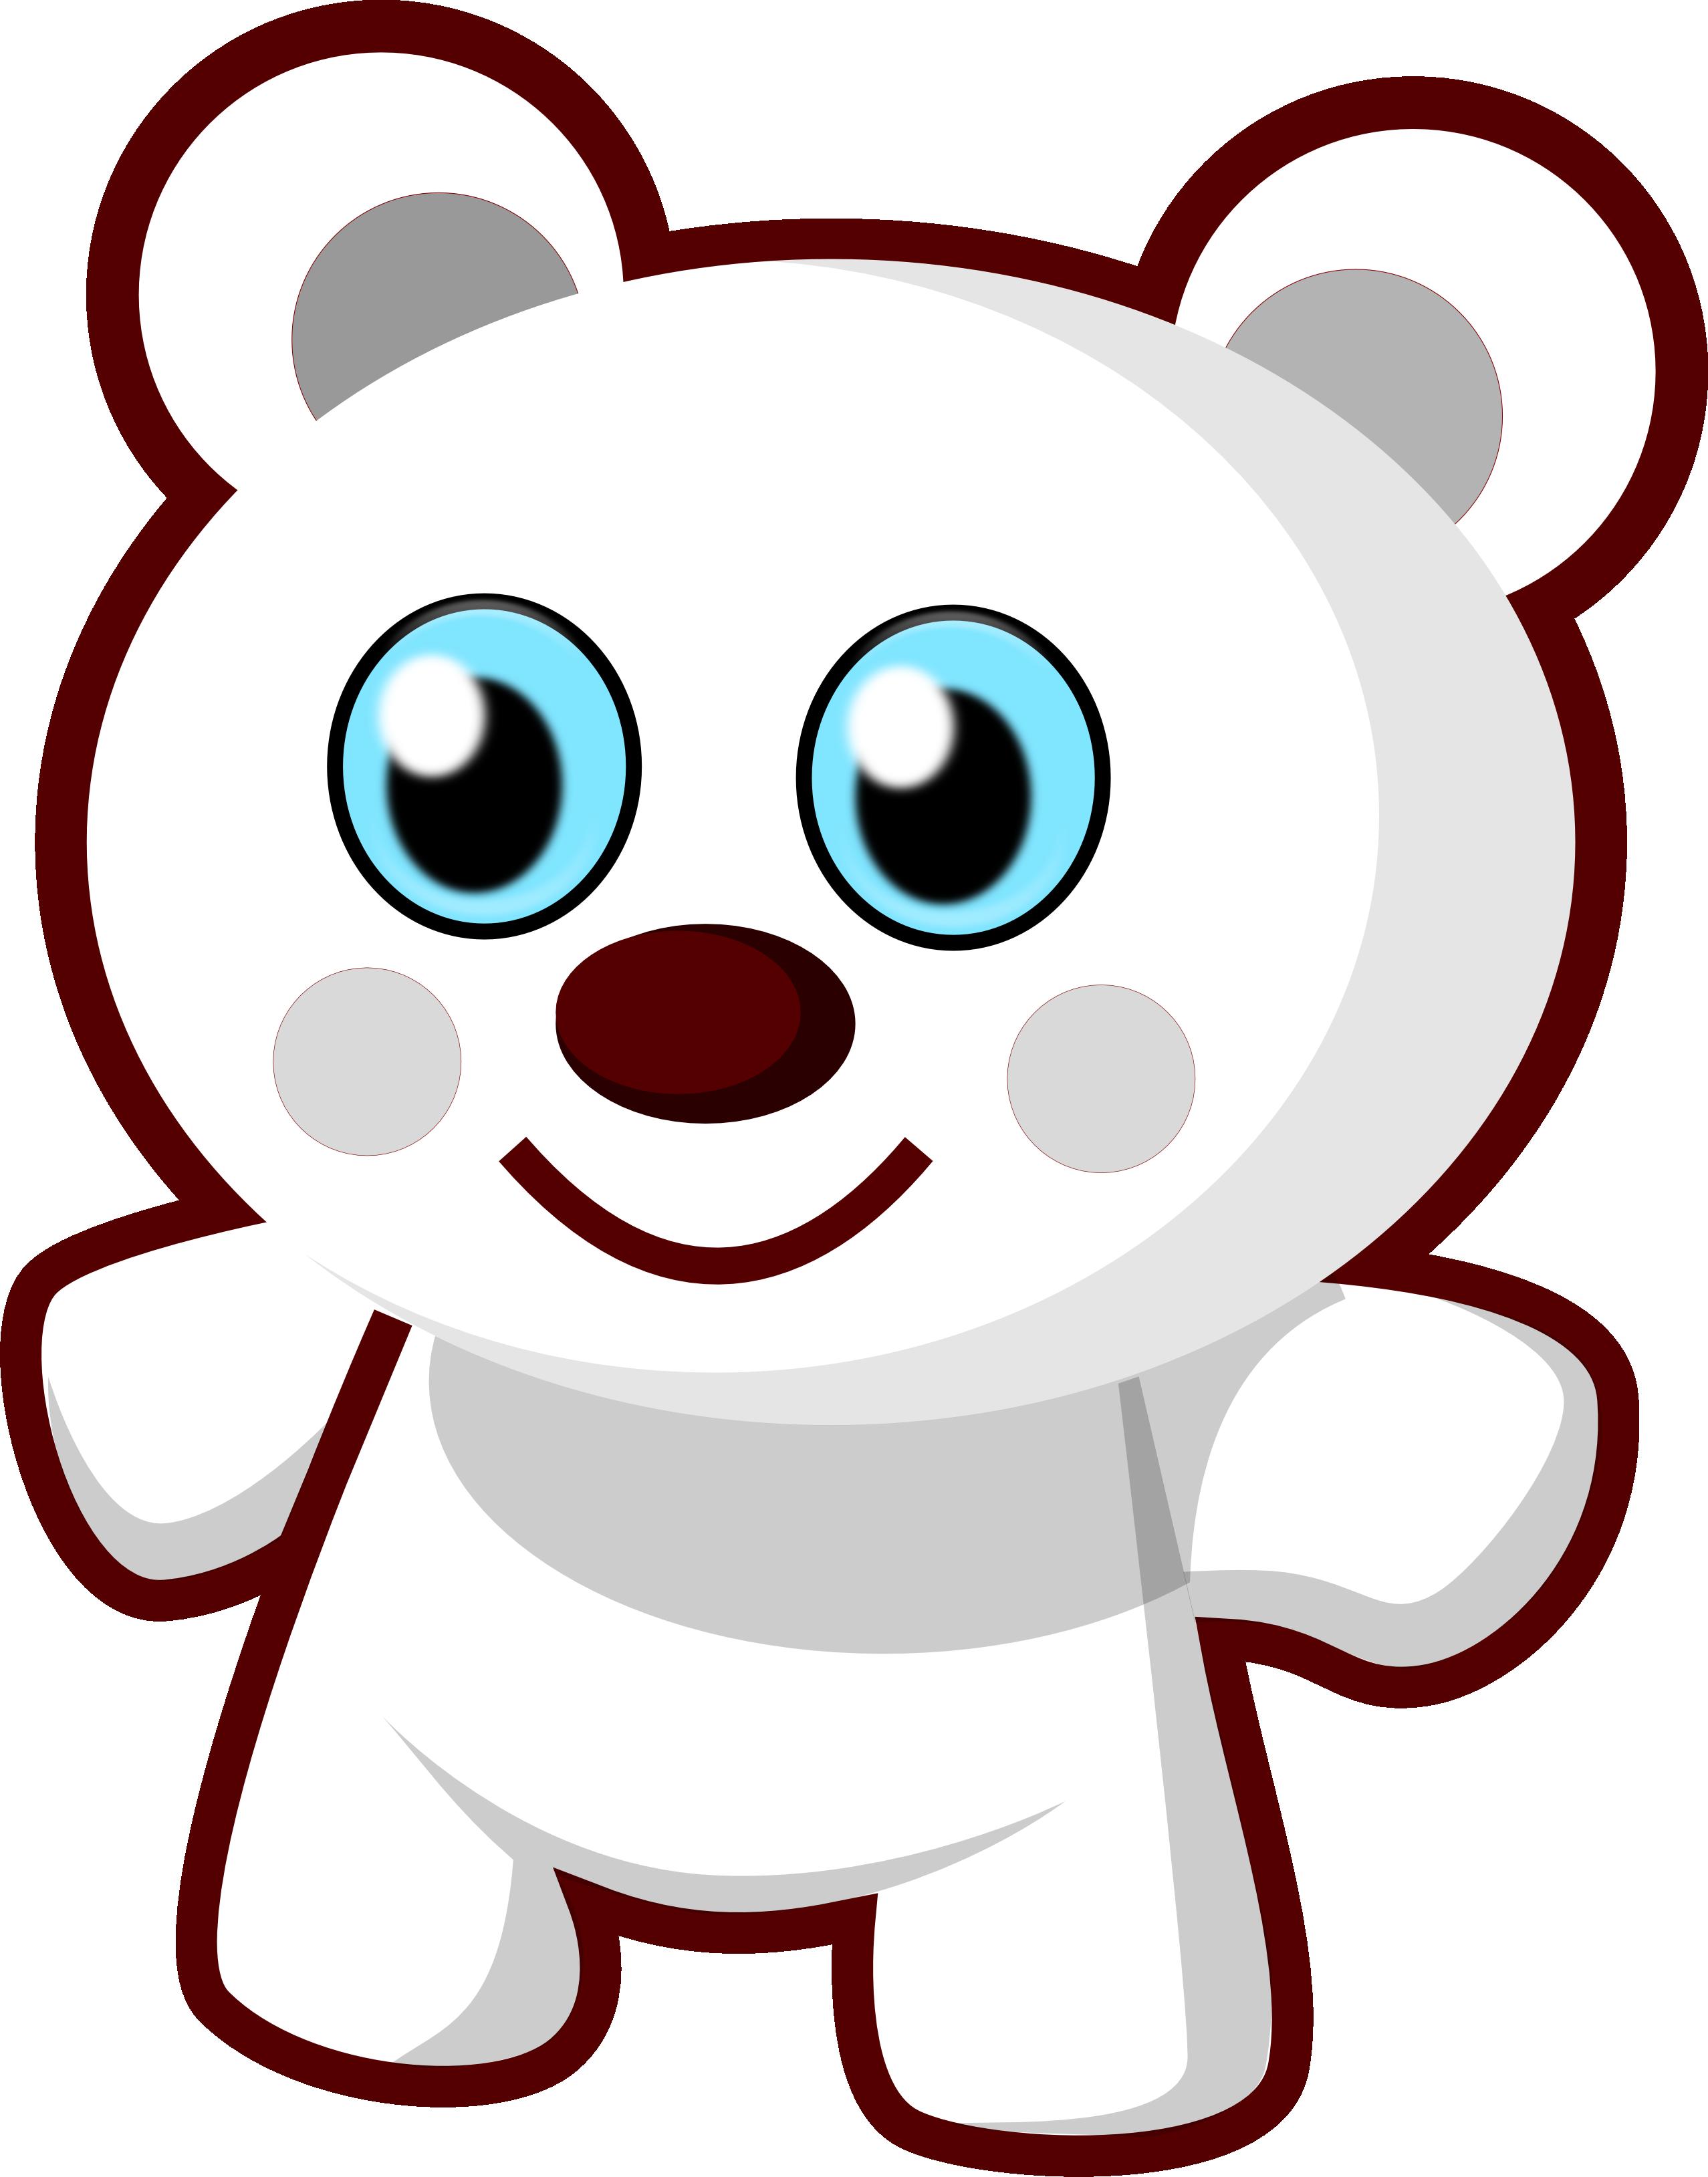 2555x3257 Cute Snake Clipart Black And White Clipart Panda